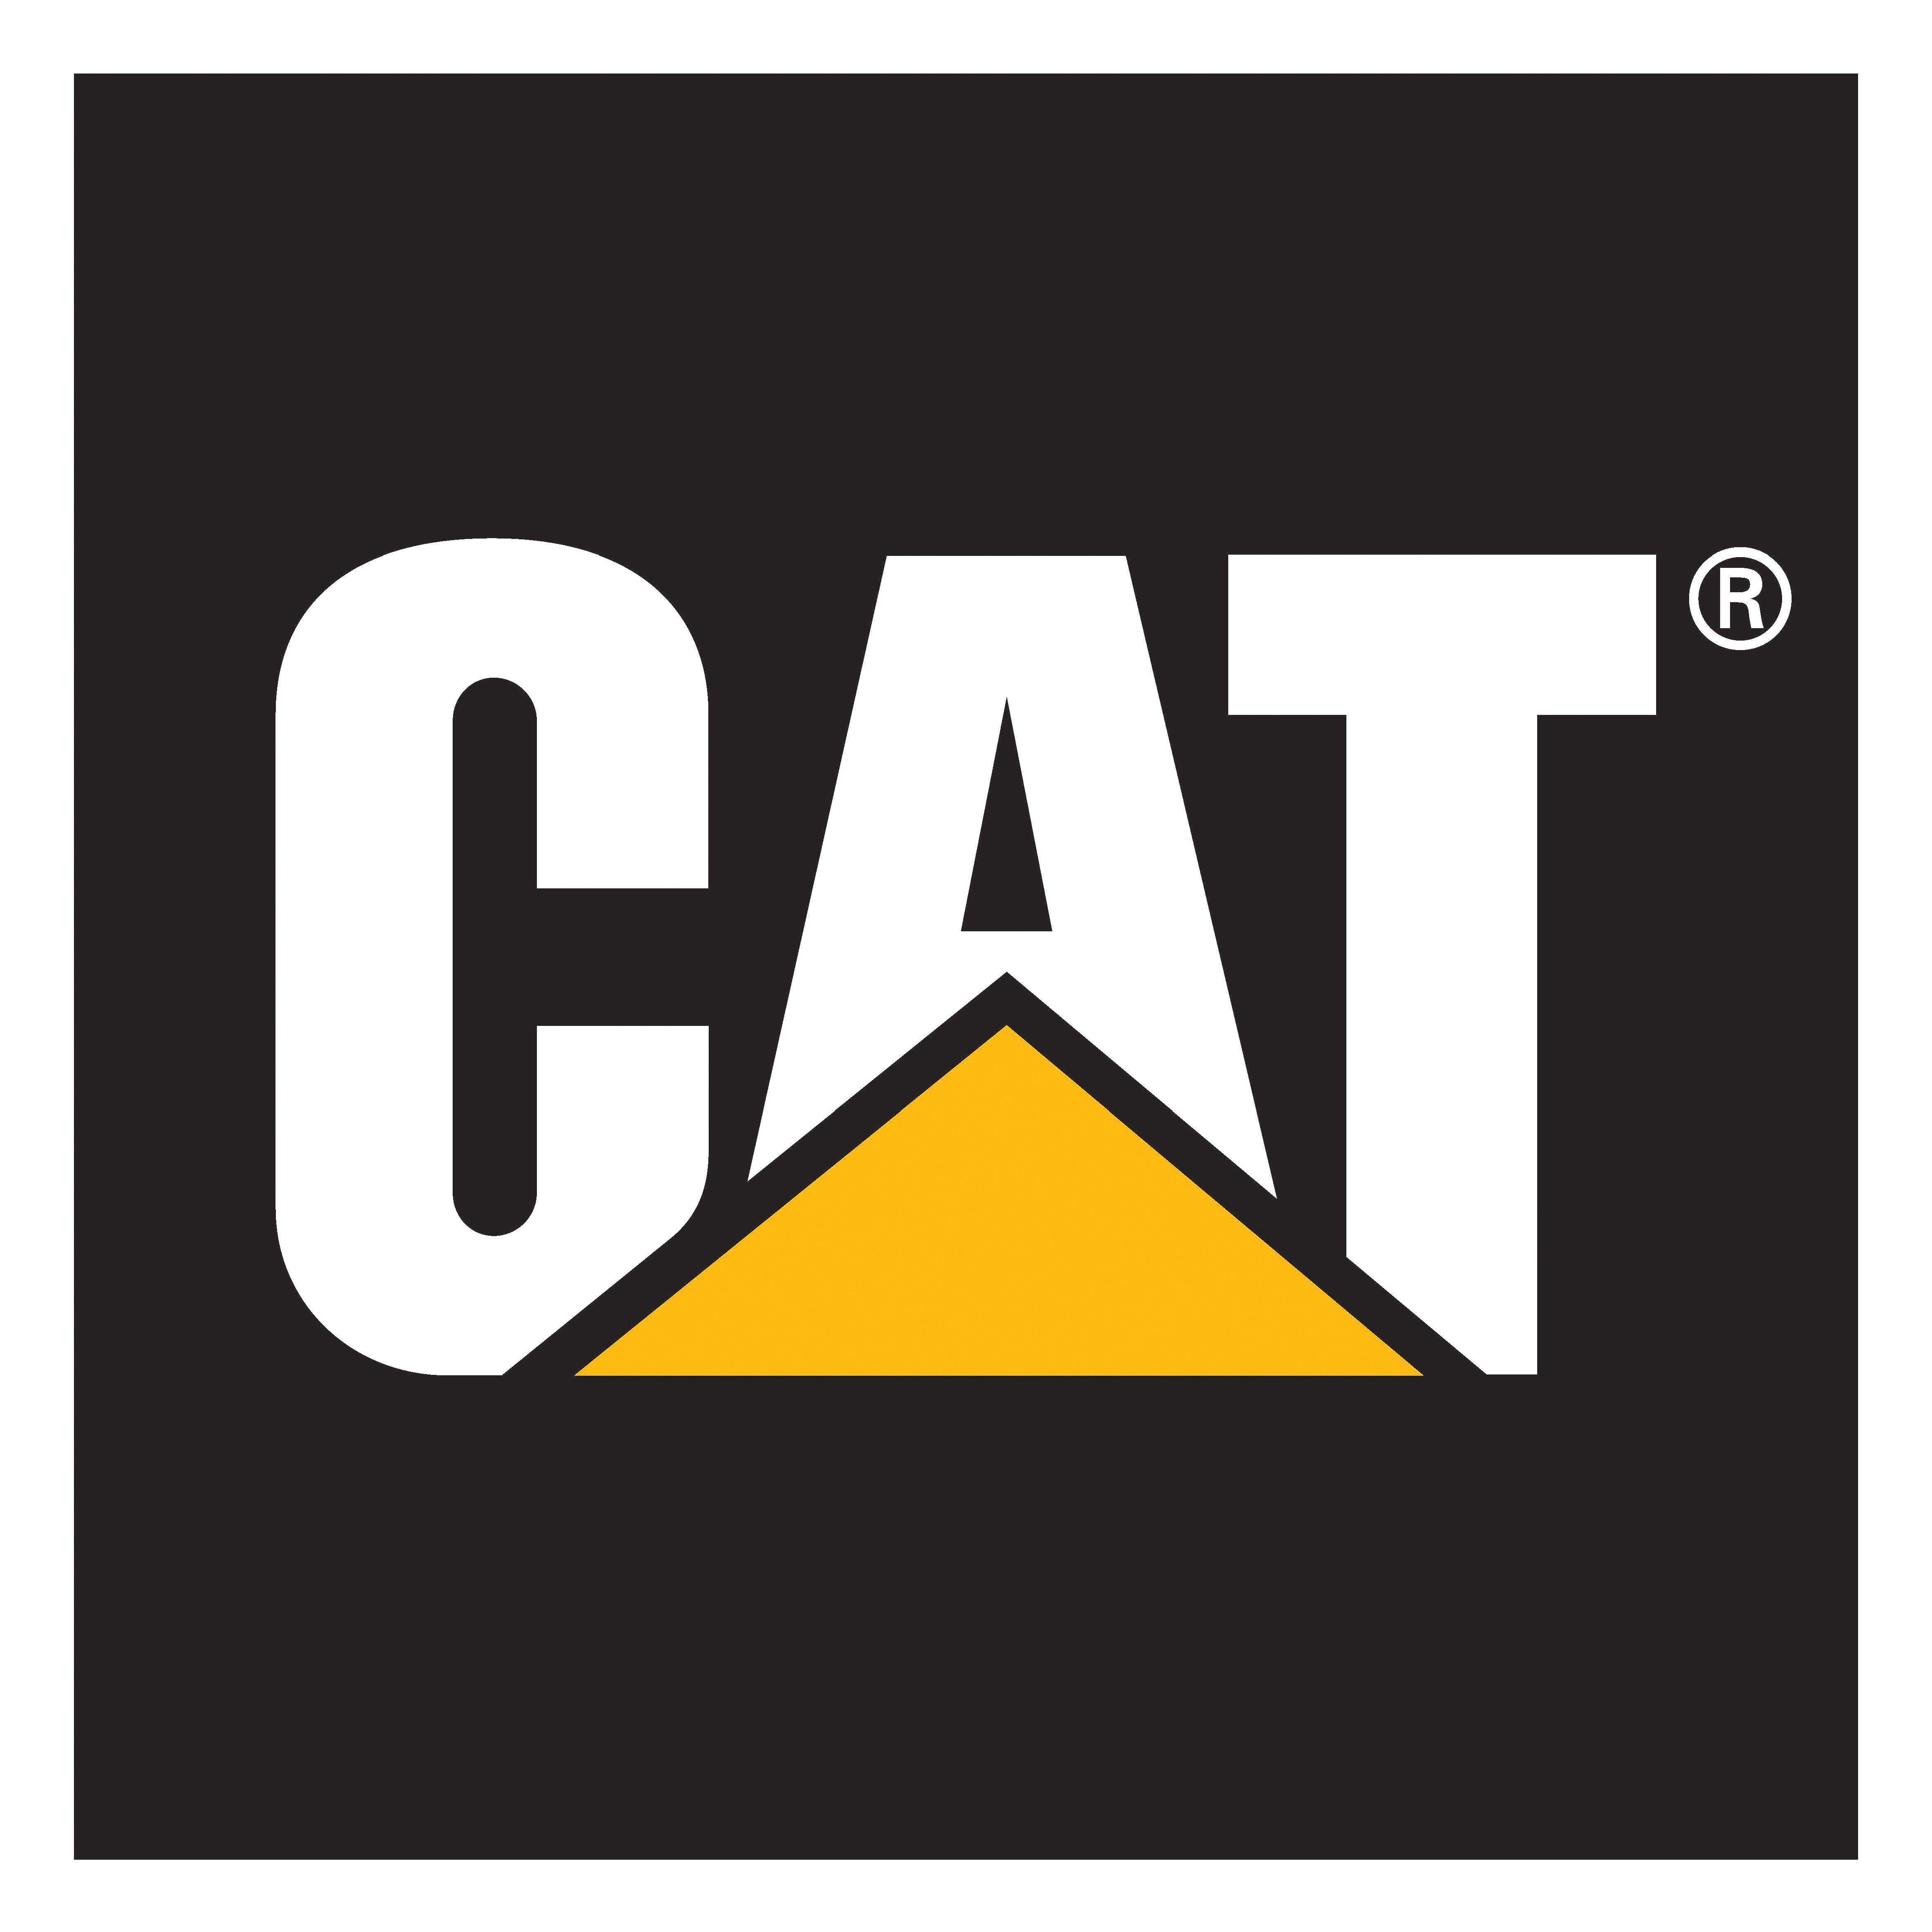 cat logo google search dd pinterest